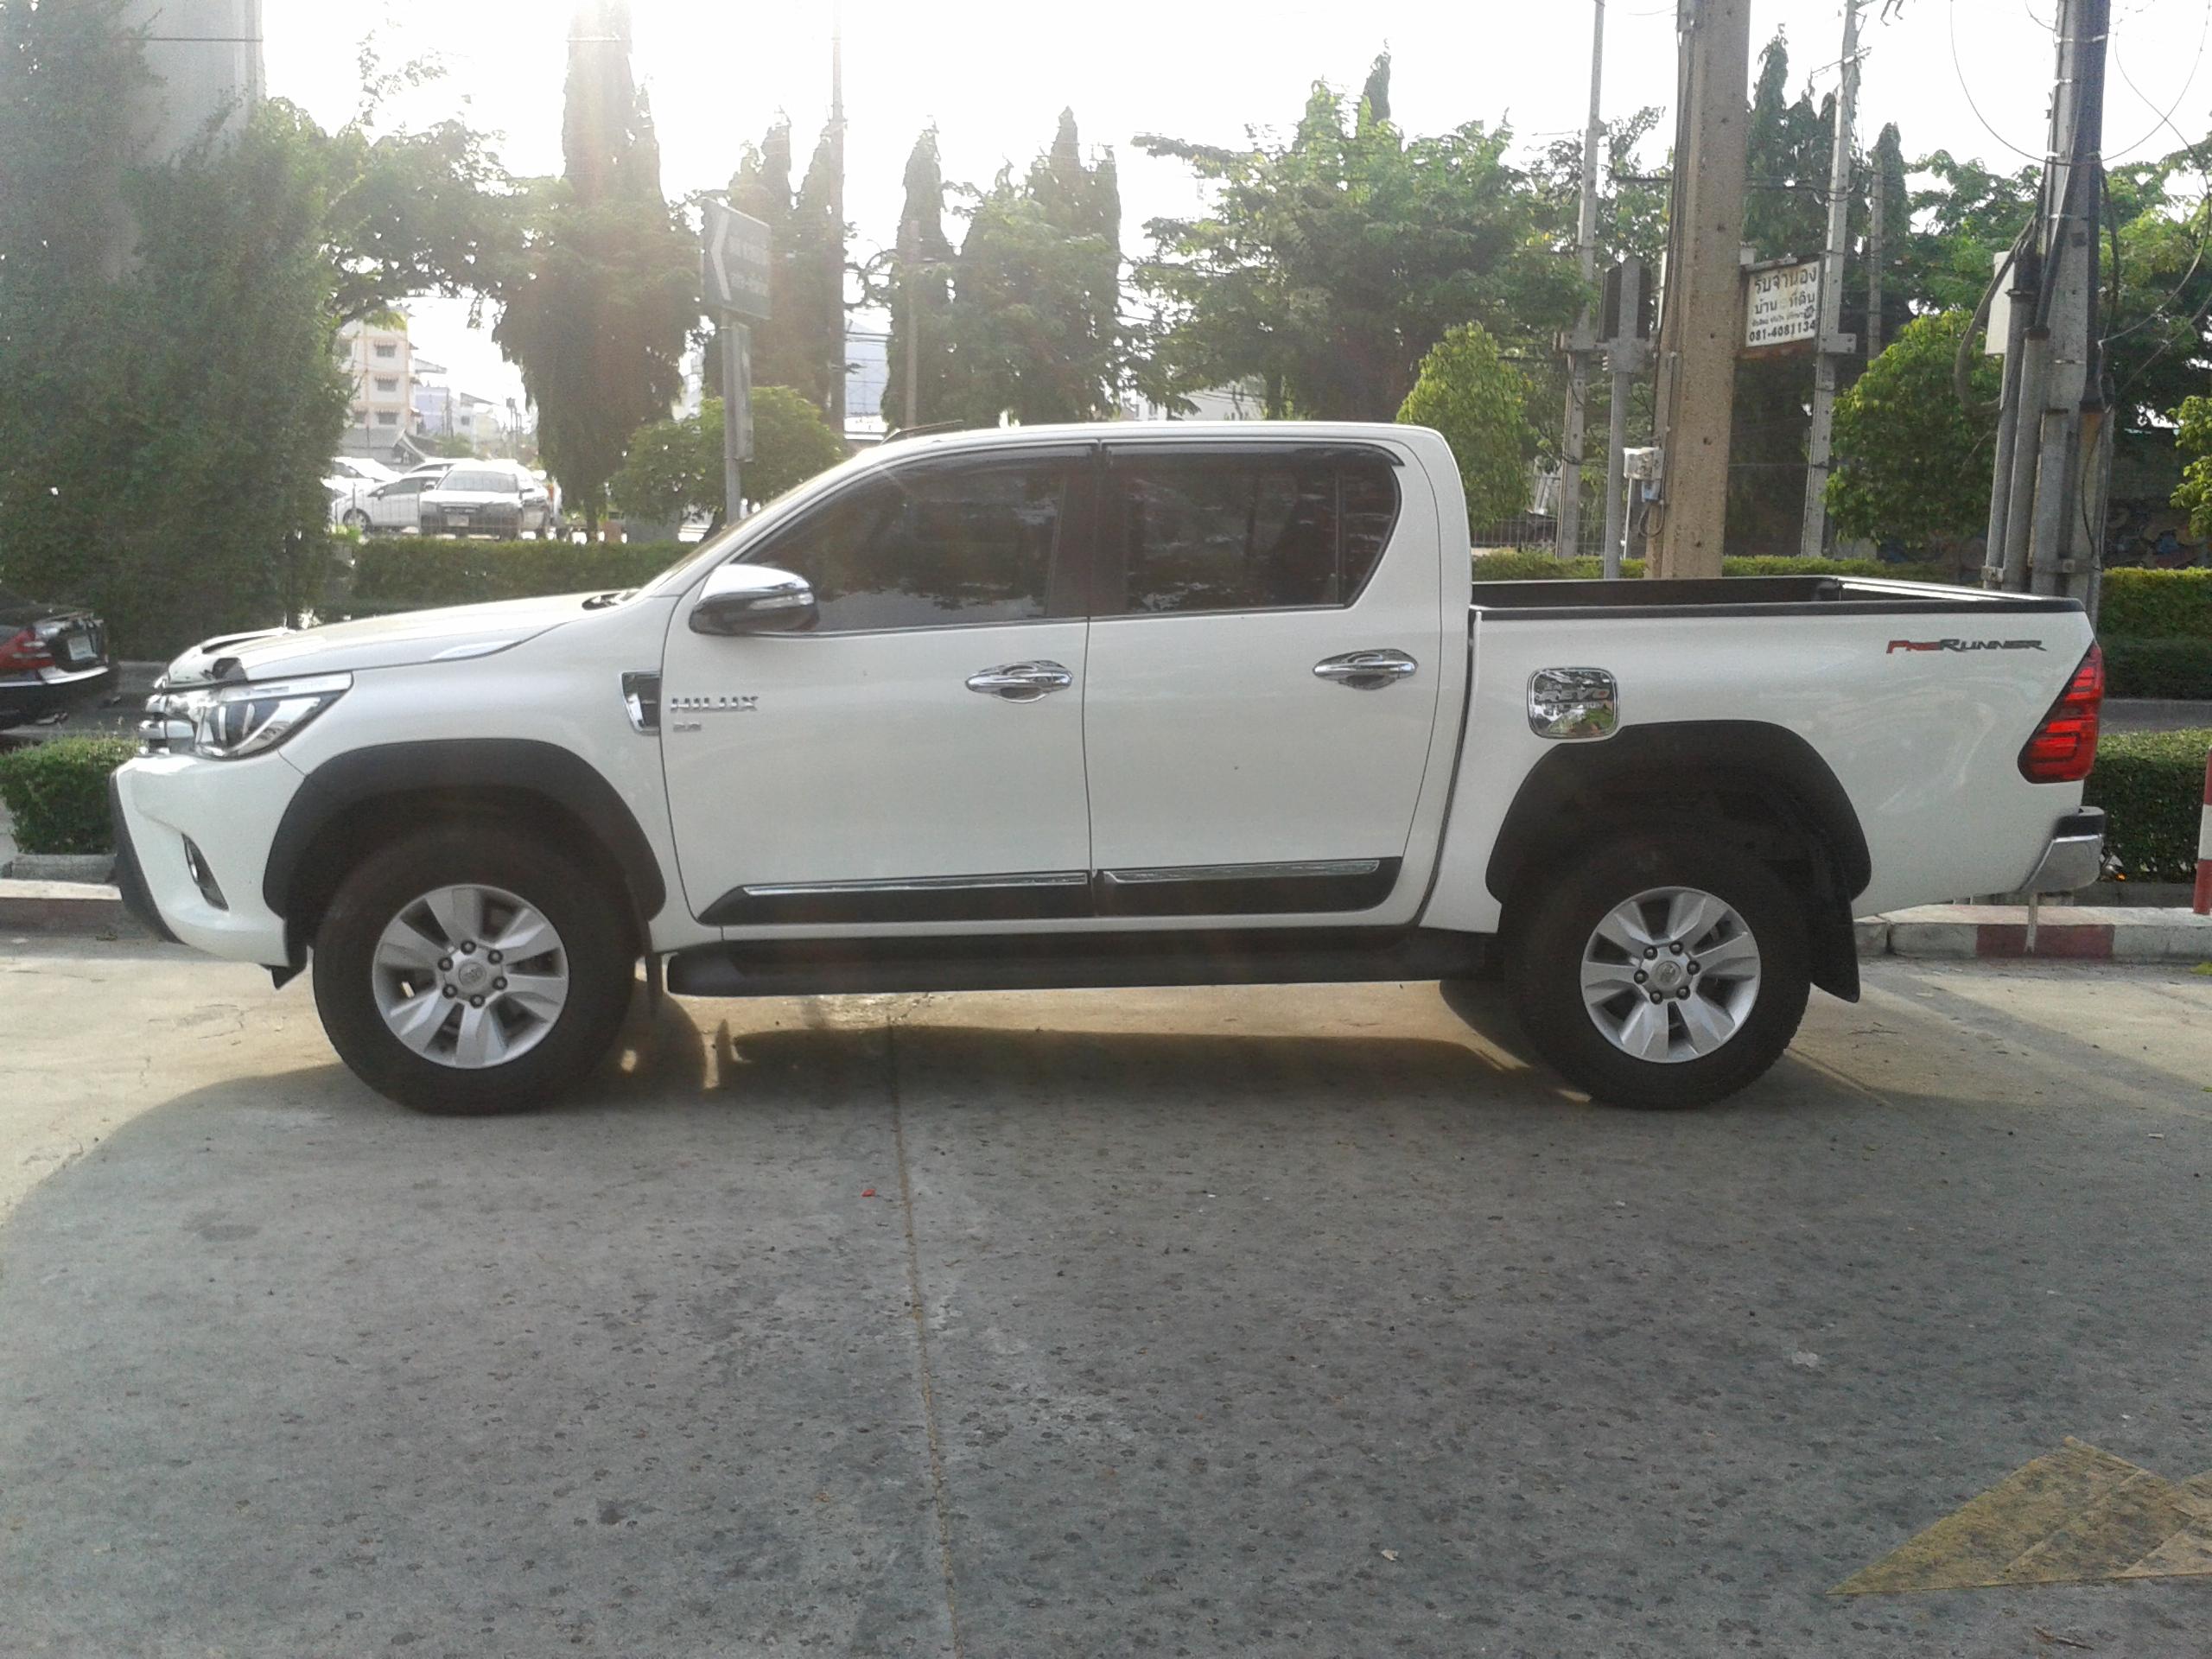 2015 Toyota Hilux 8th gen Ute vehicle